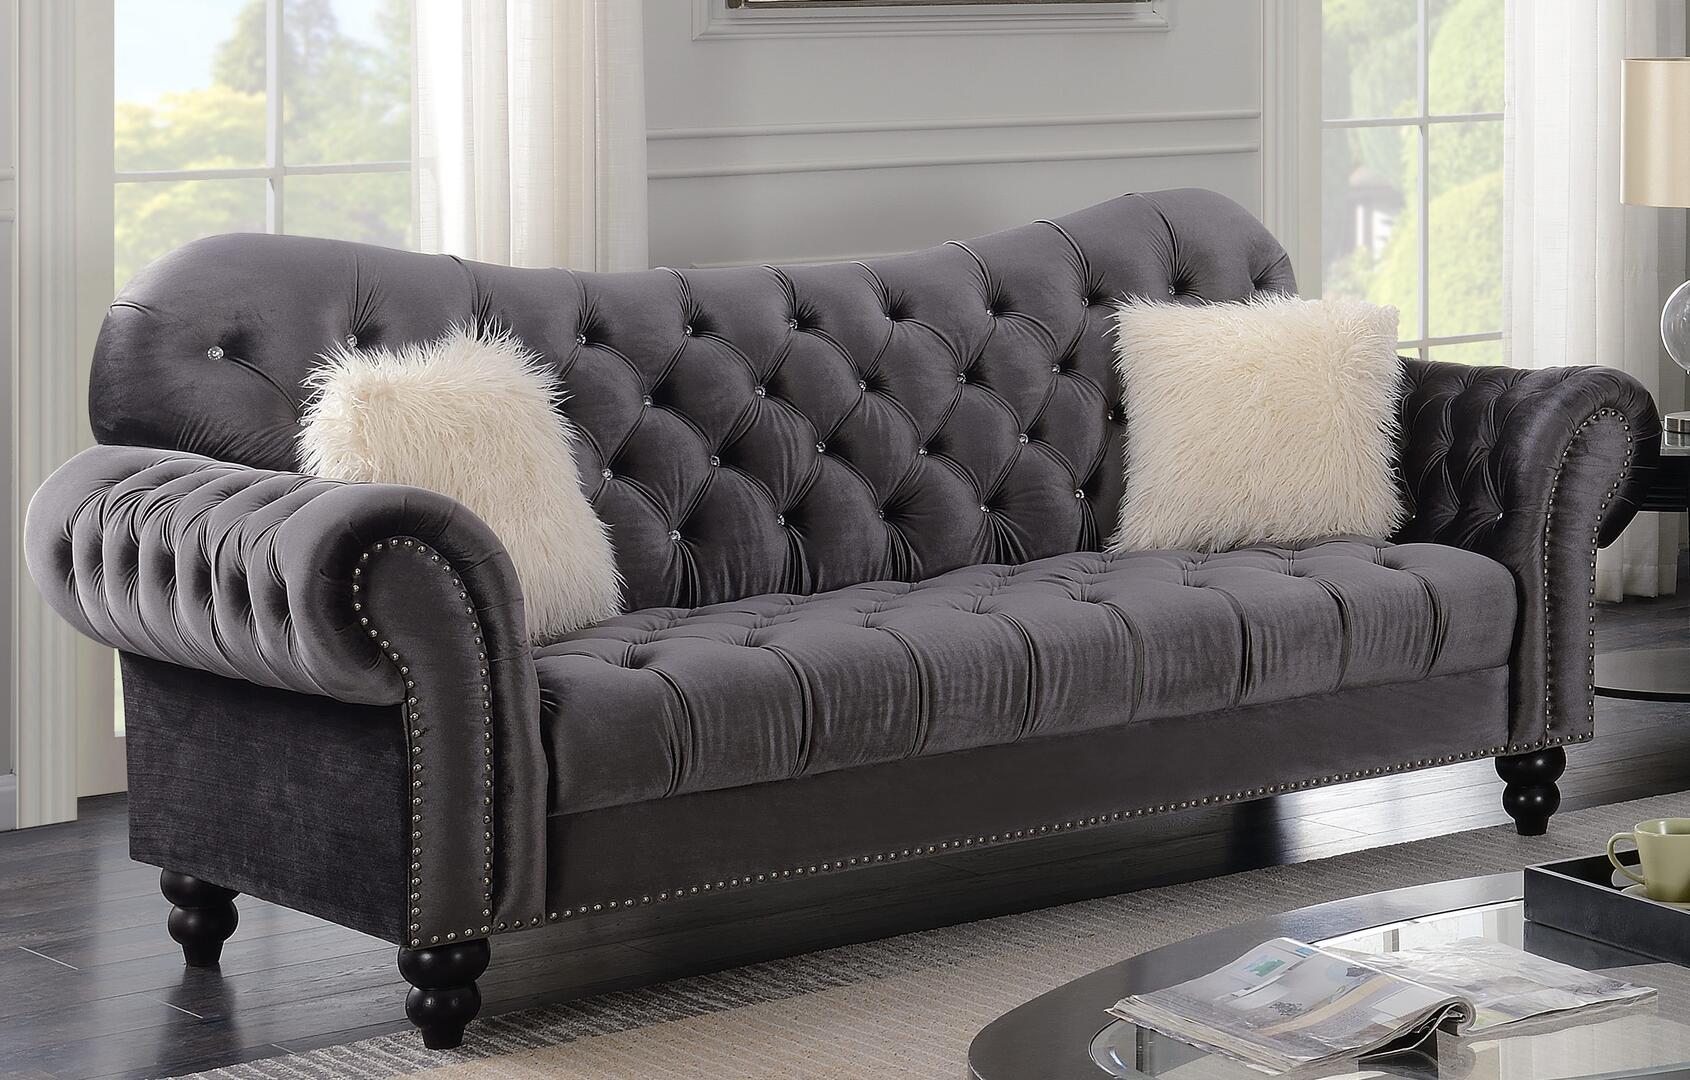 Excellent Cosmos Furniture Graciesofa Dailytribune Chair Design For Home Dailytribuneorg